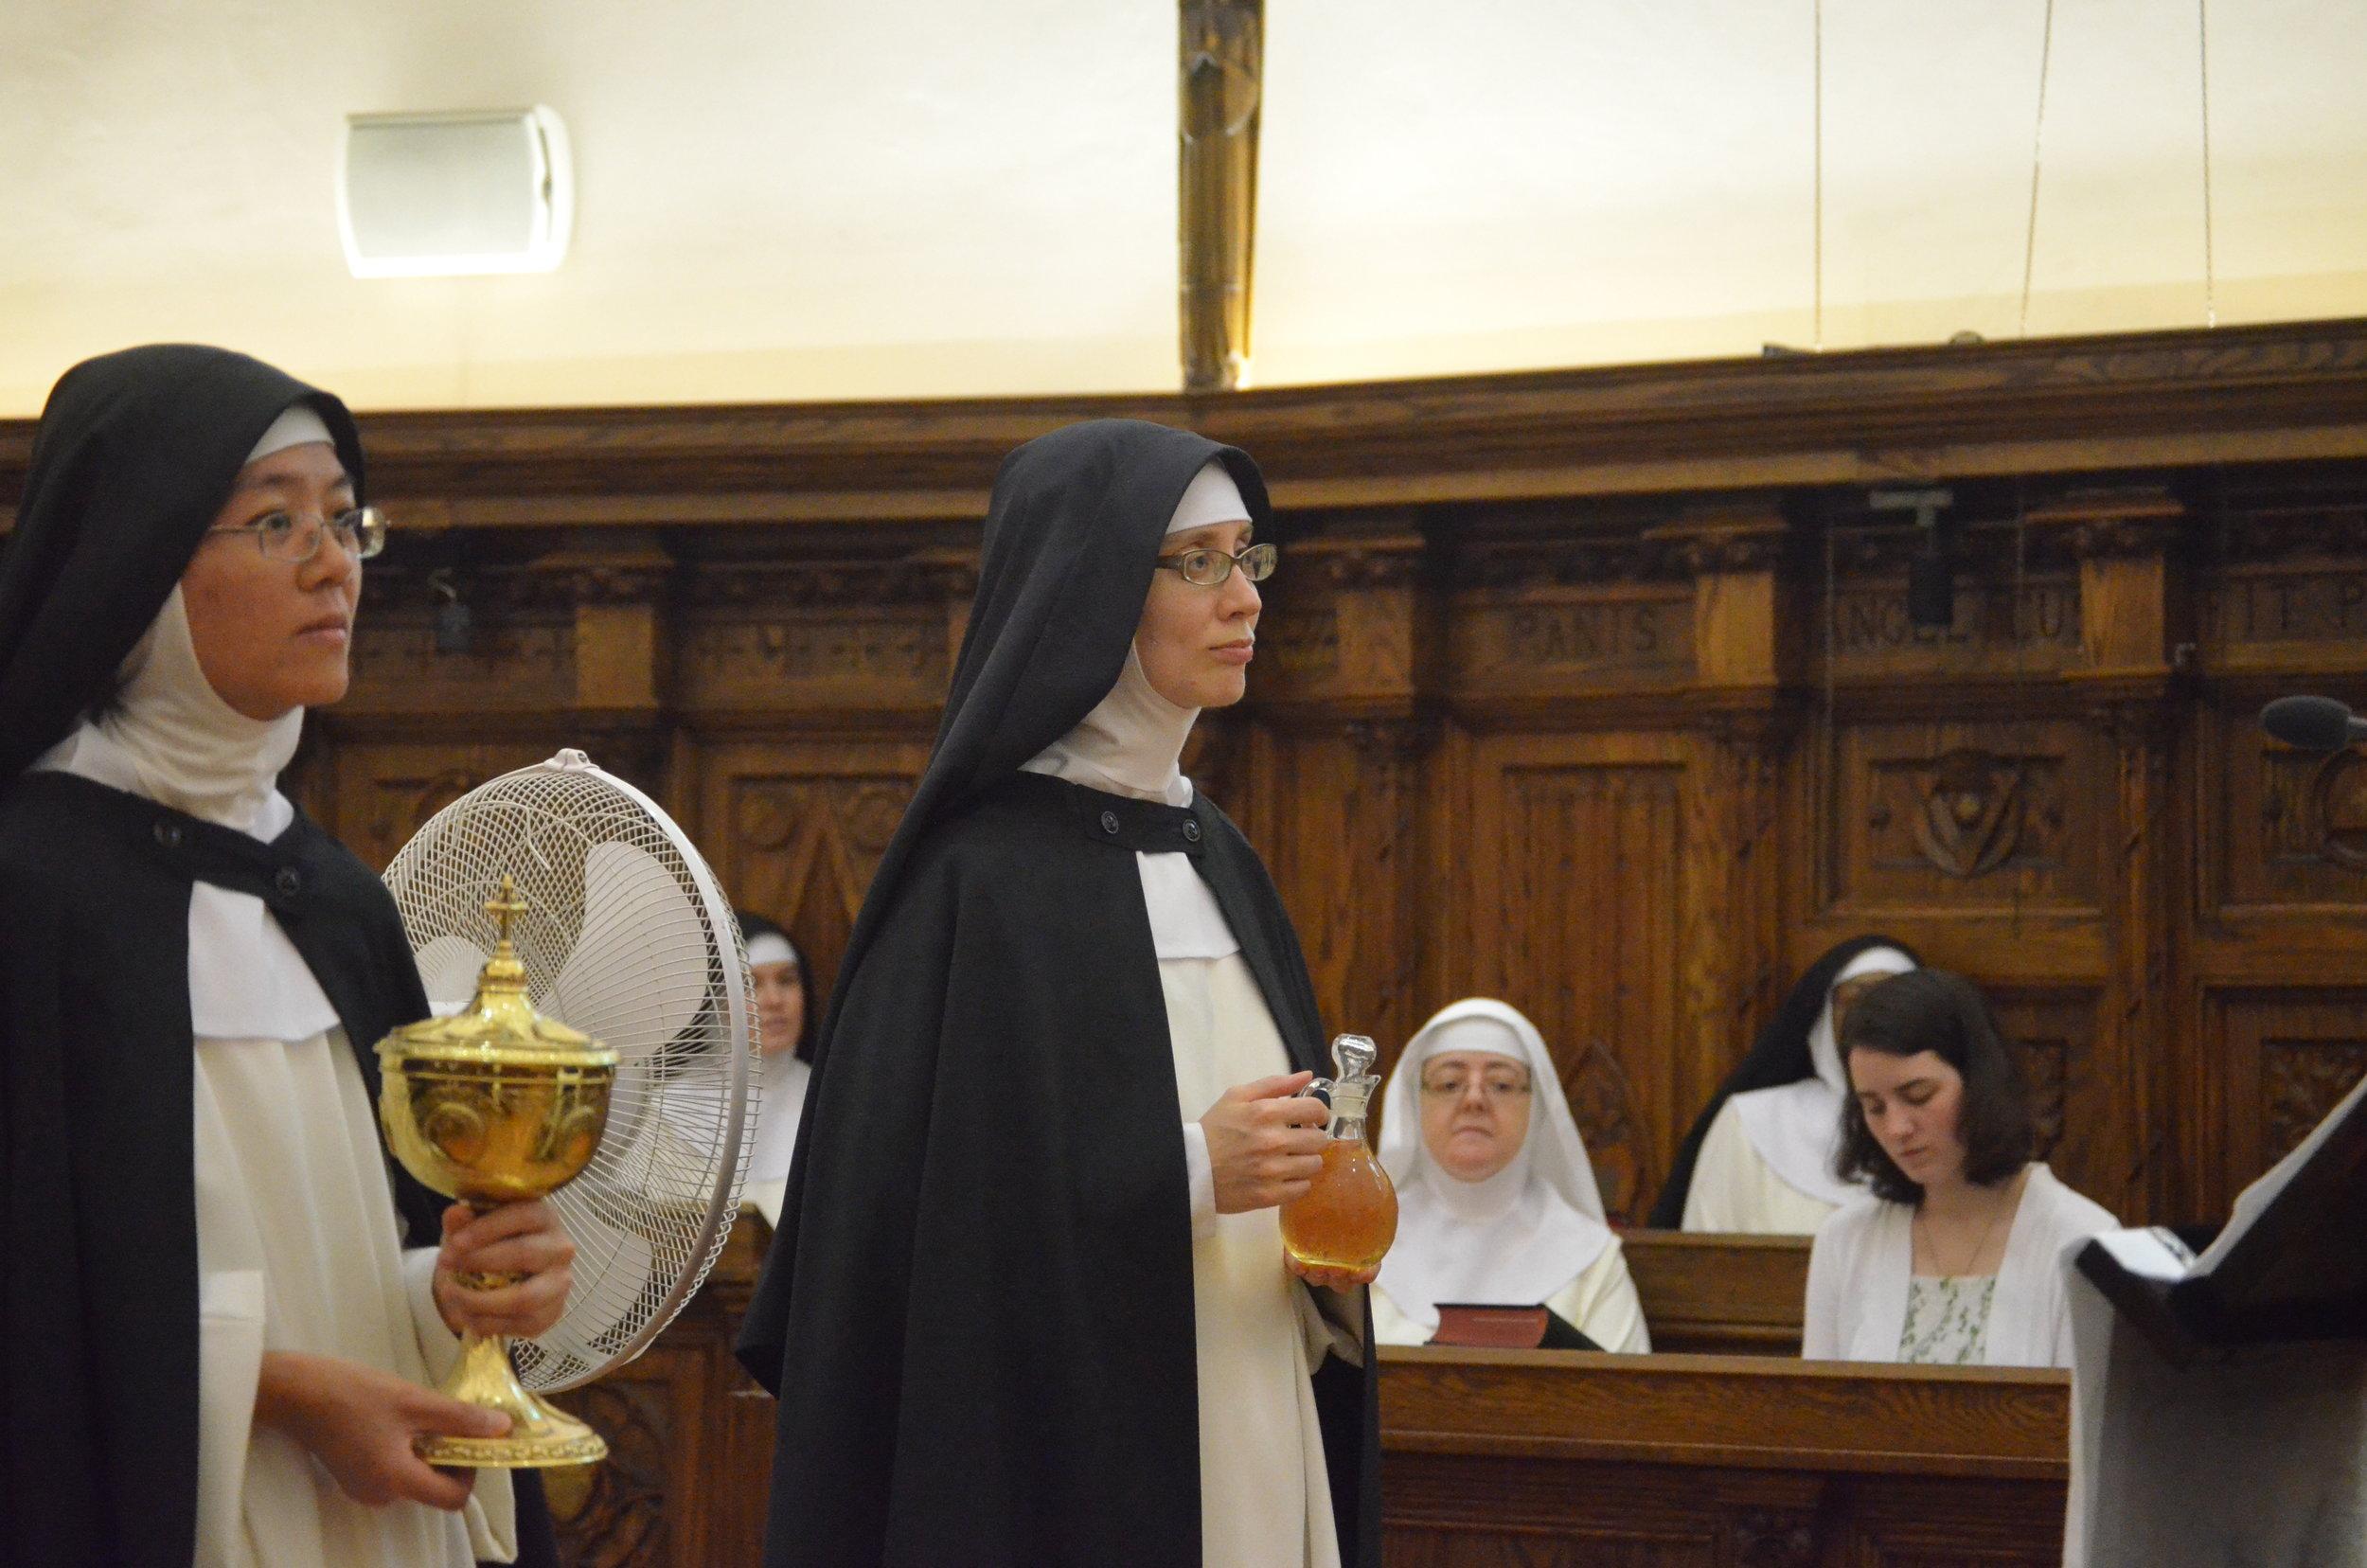 Sr. Maria Johanna brings up the gifts with her novice mistress, Sr. Joseph Maria